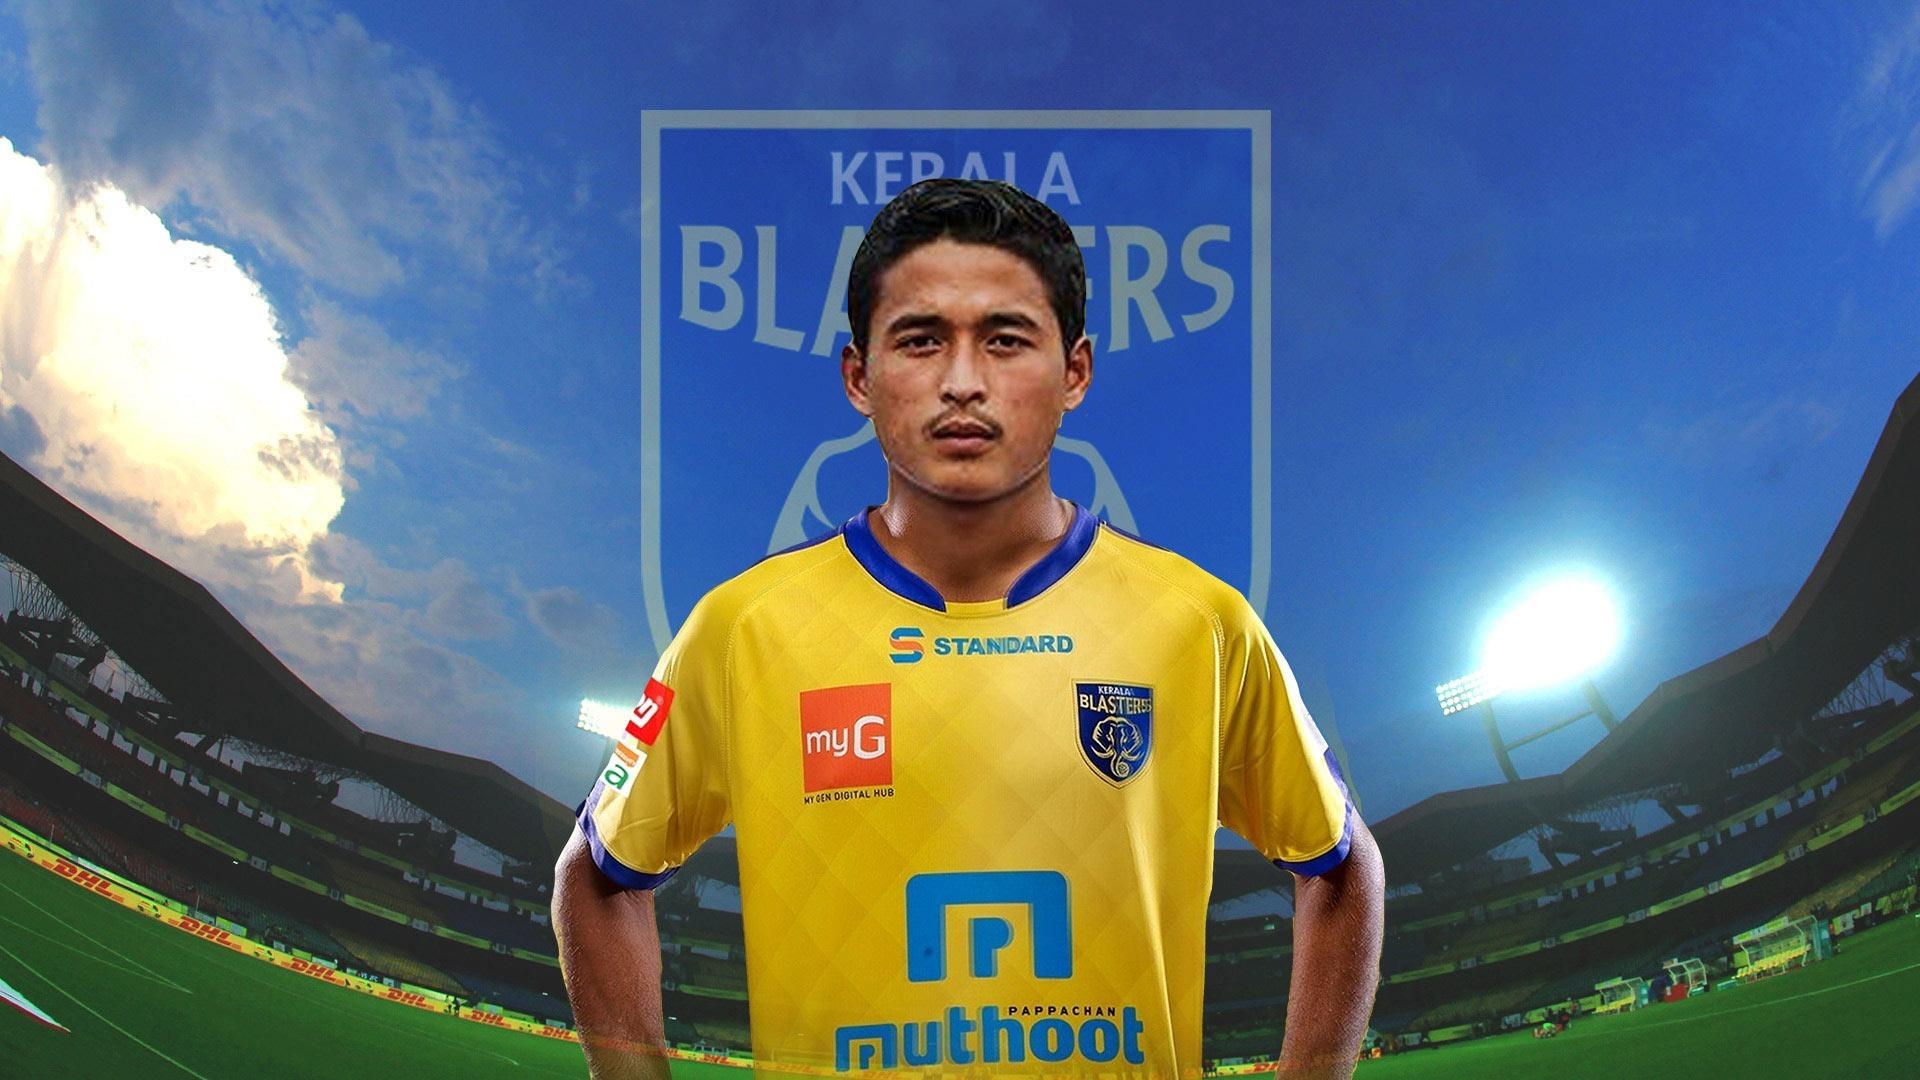 Kerala Blasters Team 2019 Hd Wallpapers backgrounds Download 1920x1080